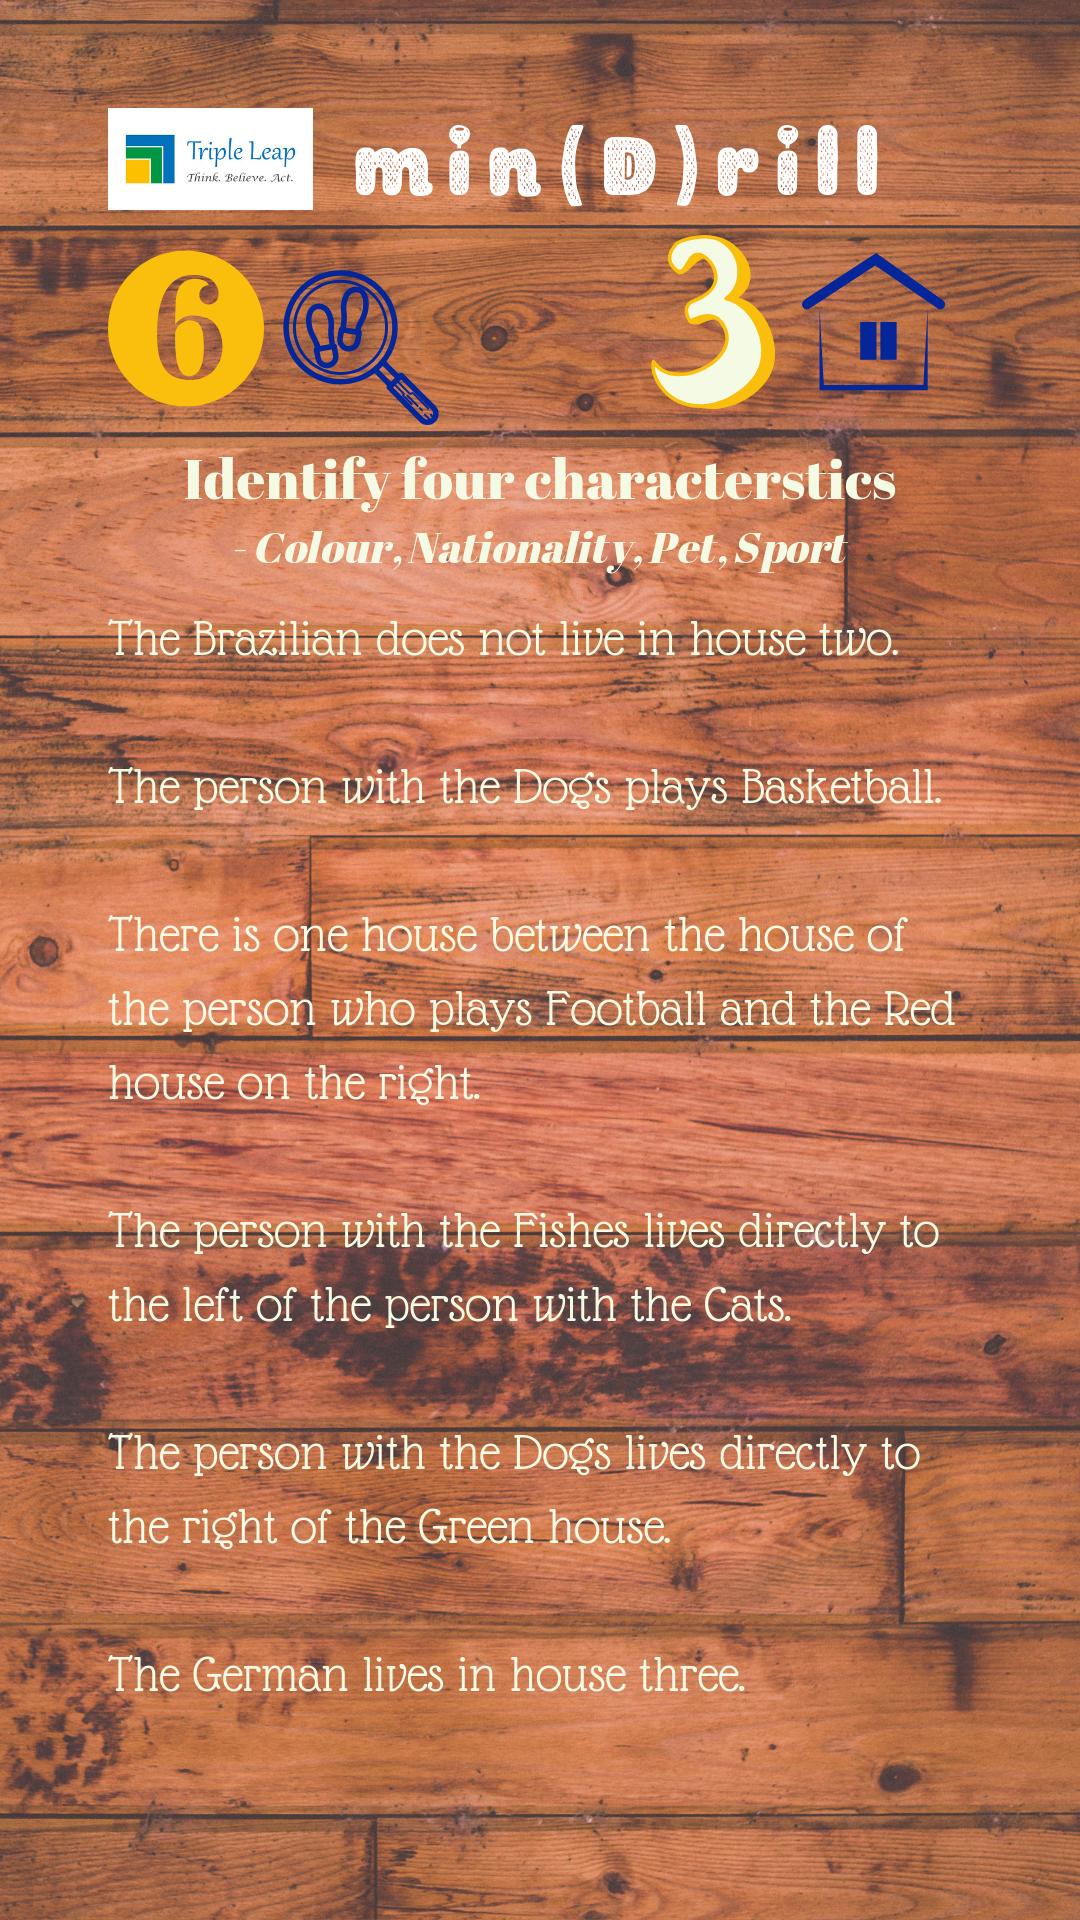 6 clues, 3 houses, 4 characterstics identify them